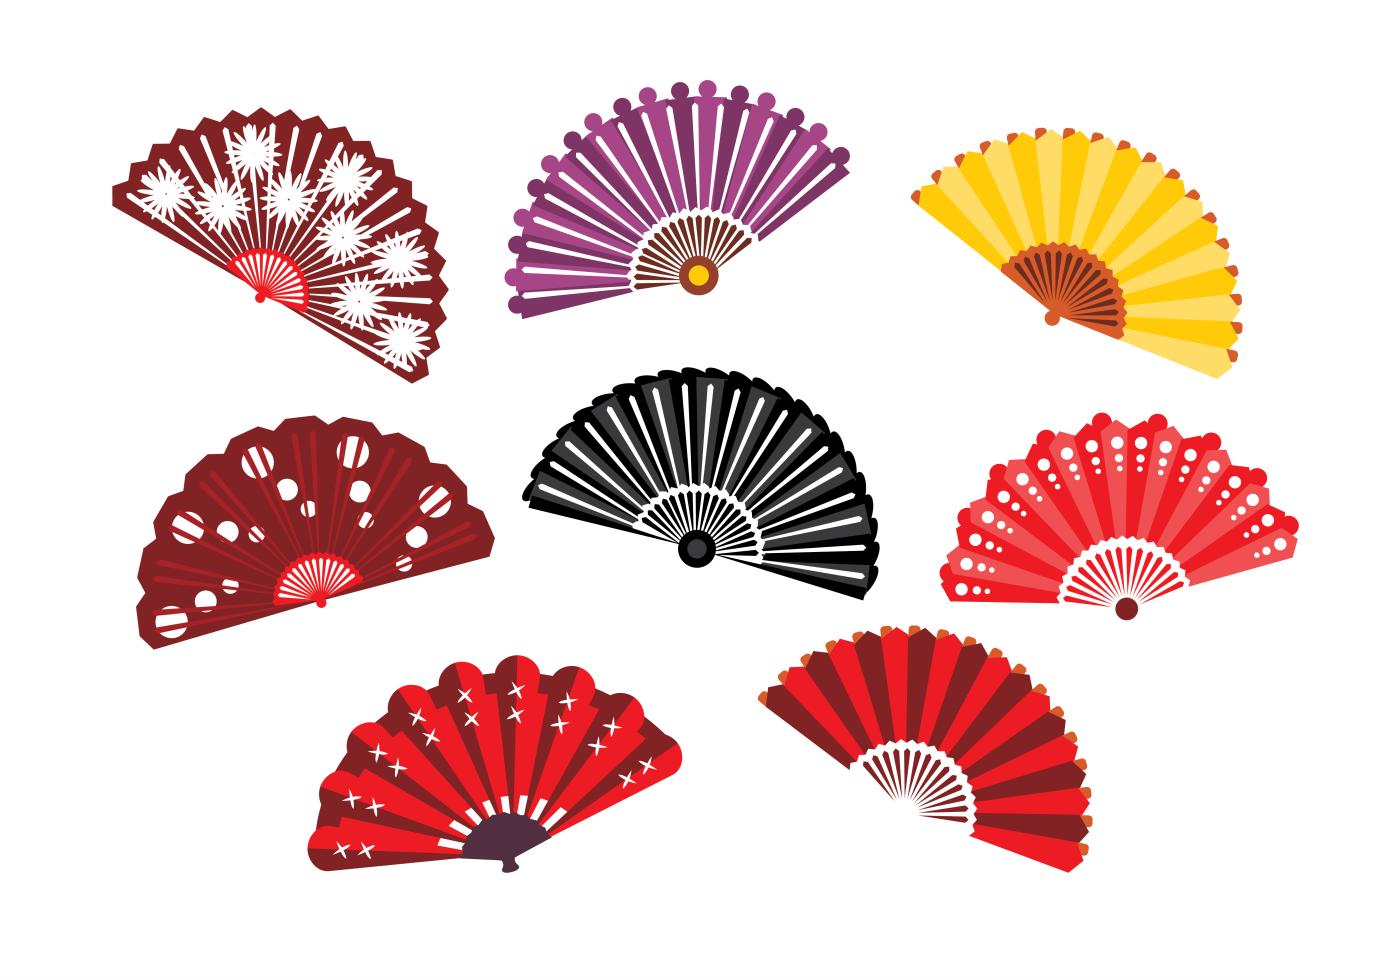 Chinese Fan Free Vector Art - (2,552 Free Downloads)